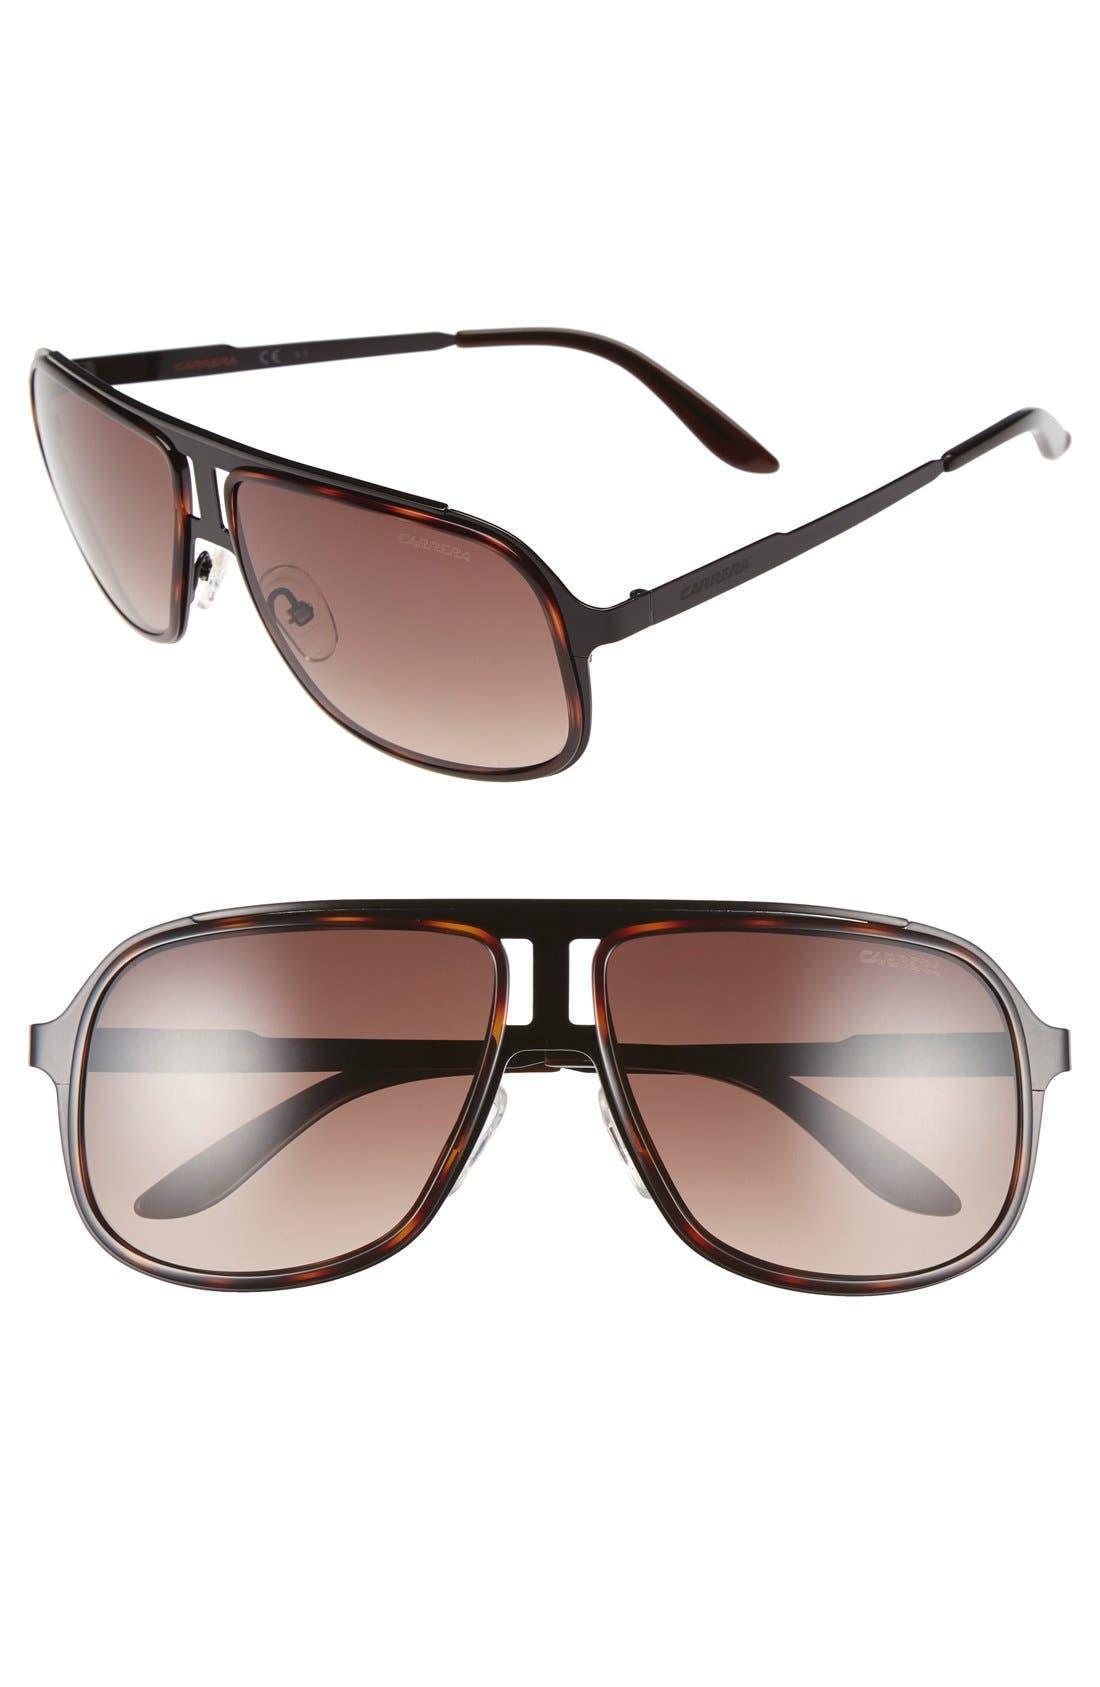 59mm Aviator Sunglasses,                         Main,                         color, Black Havana/ Brown